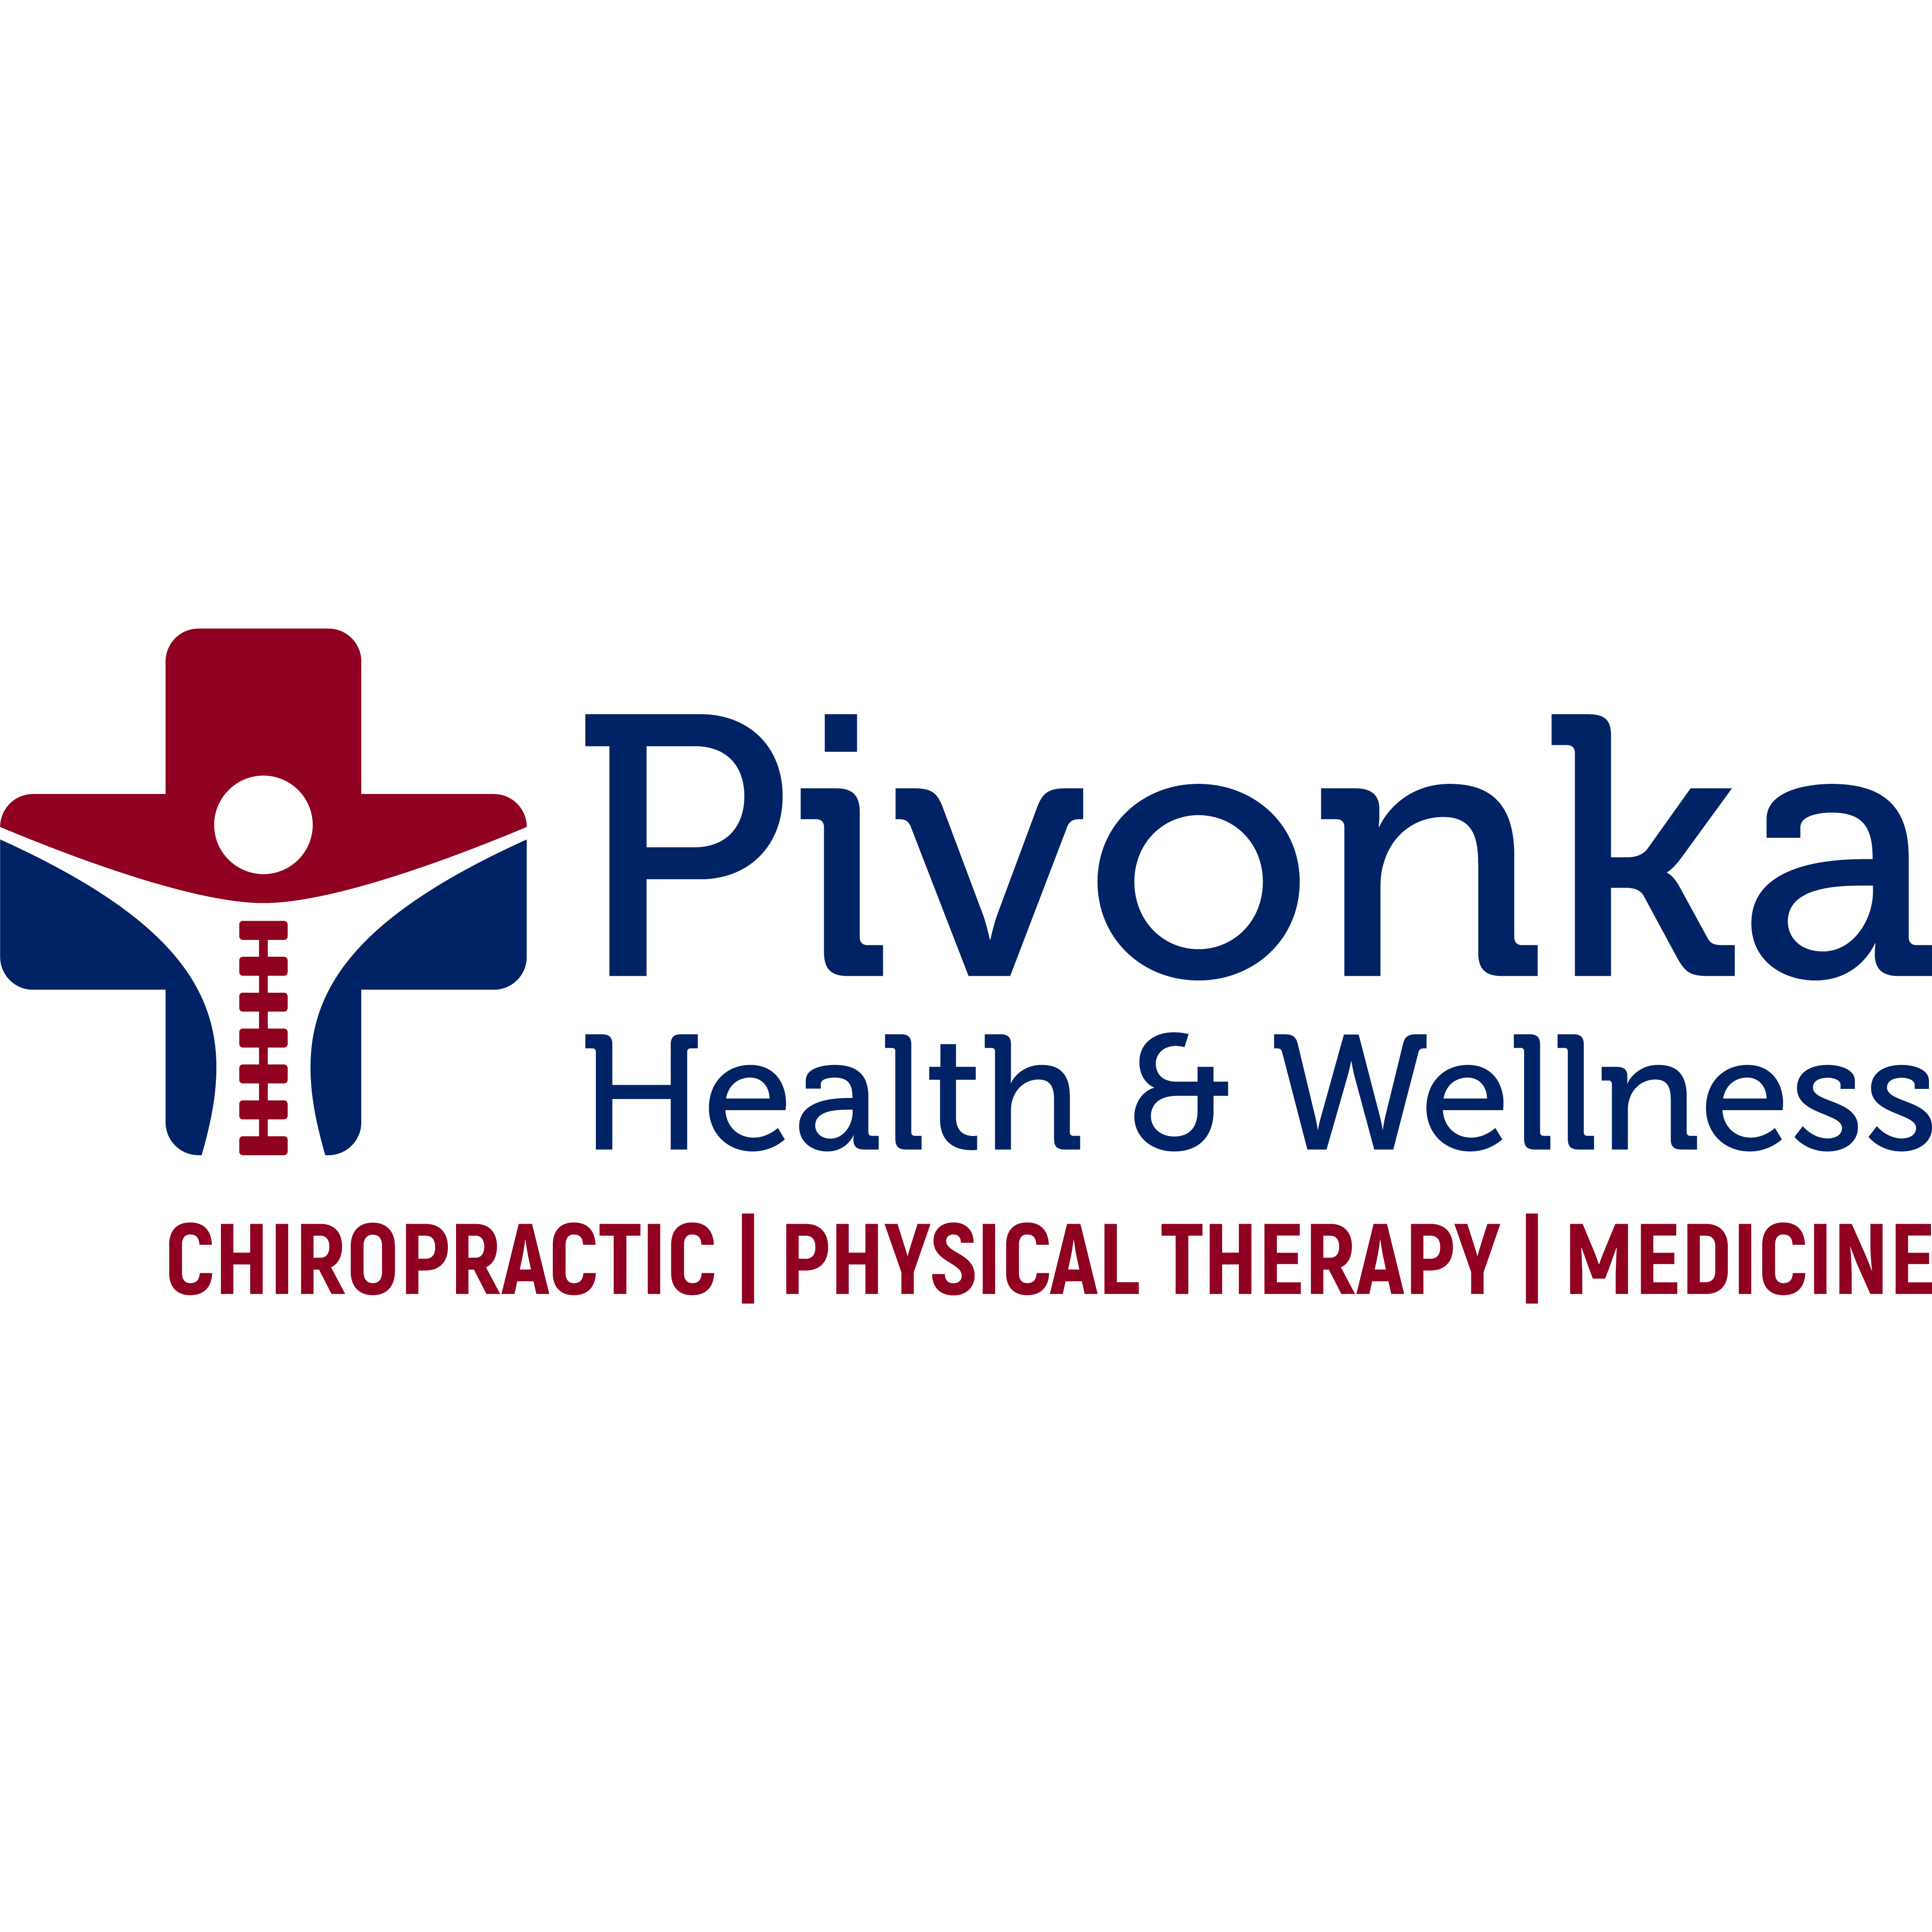 Pivonka Health and Wellness